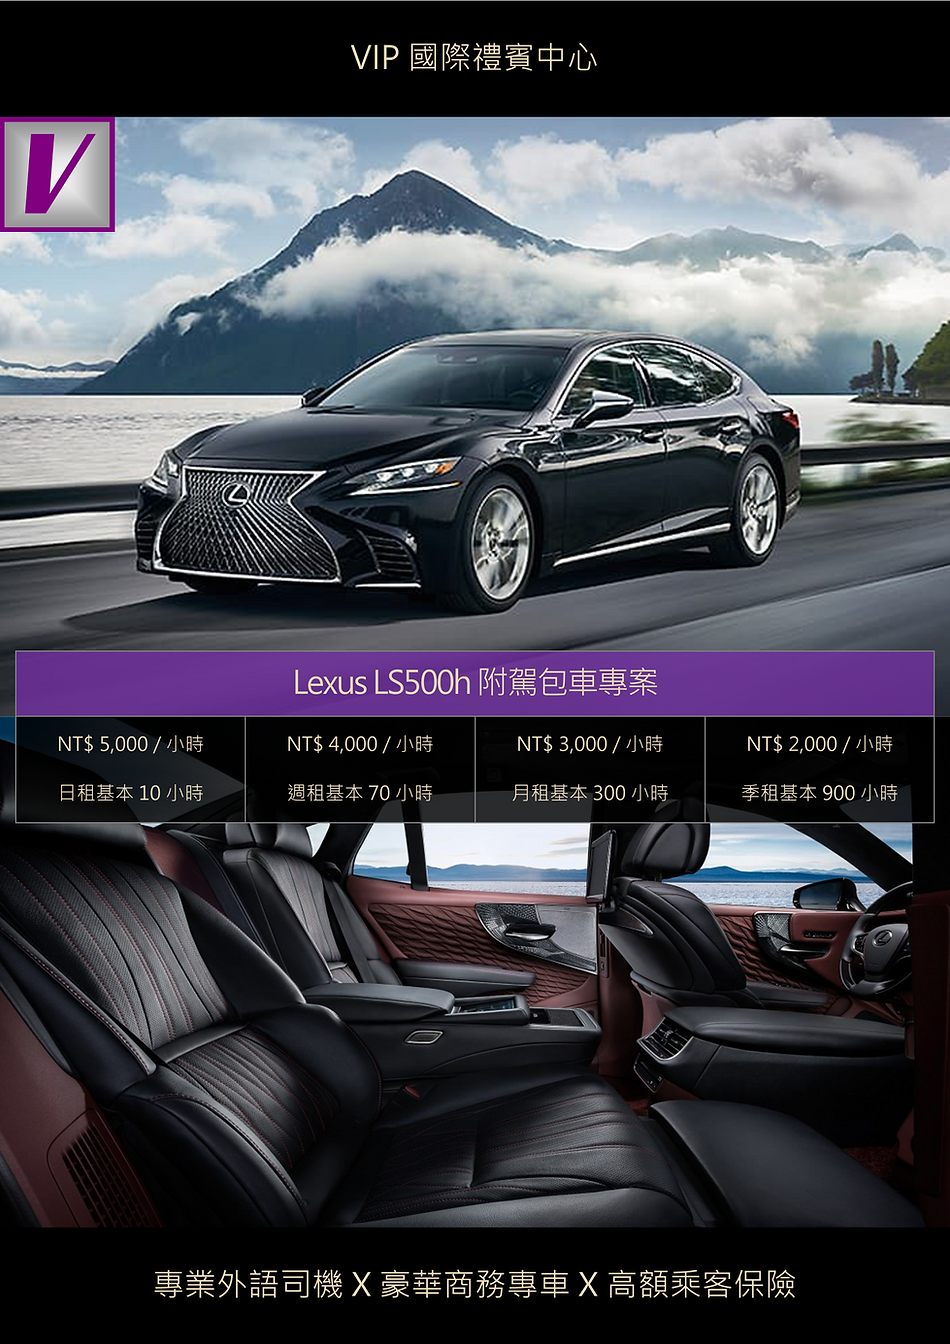 VIP國際禮賓中心 LEXUS LS500h 附駕包車專案 DM.png